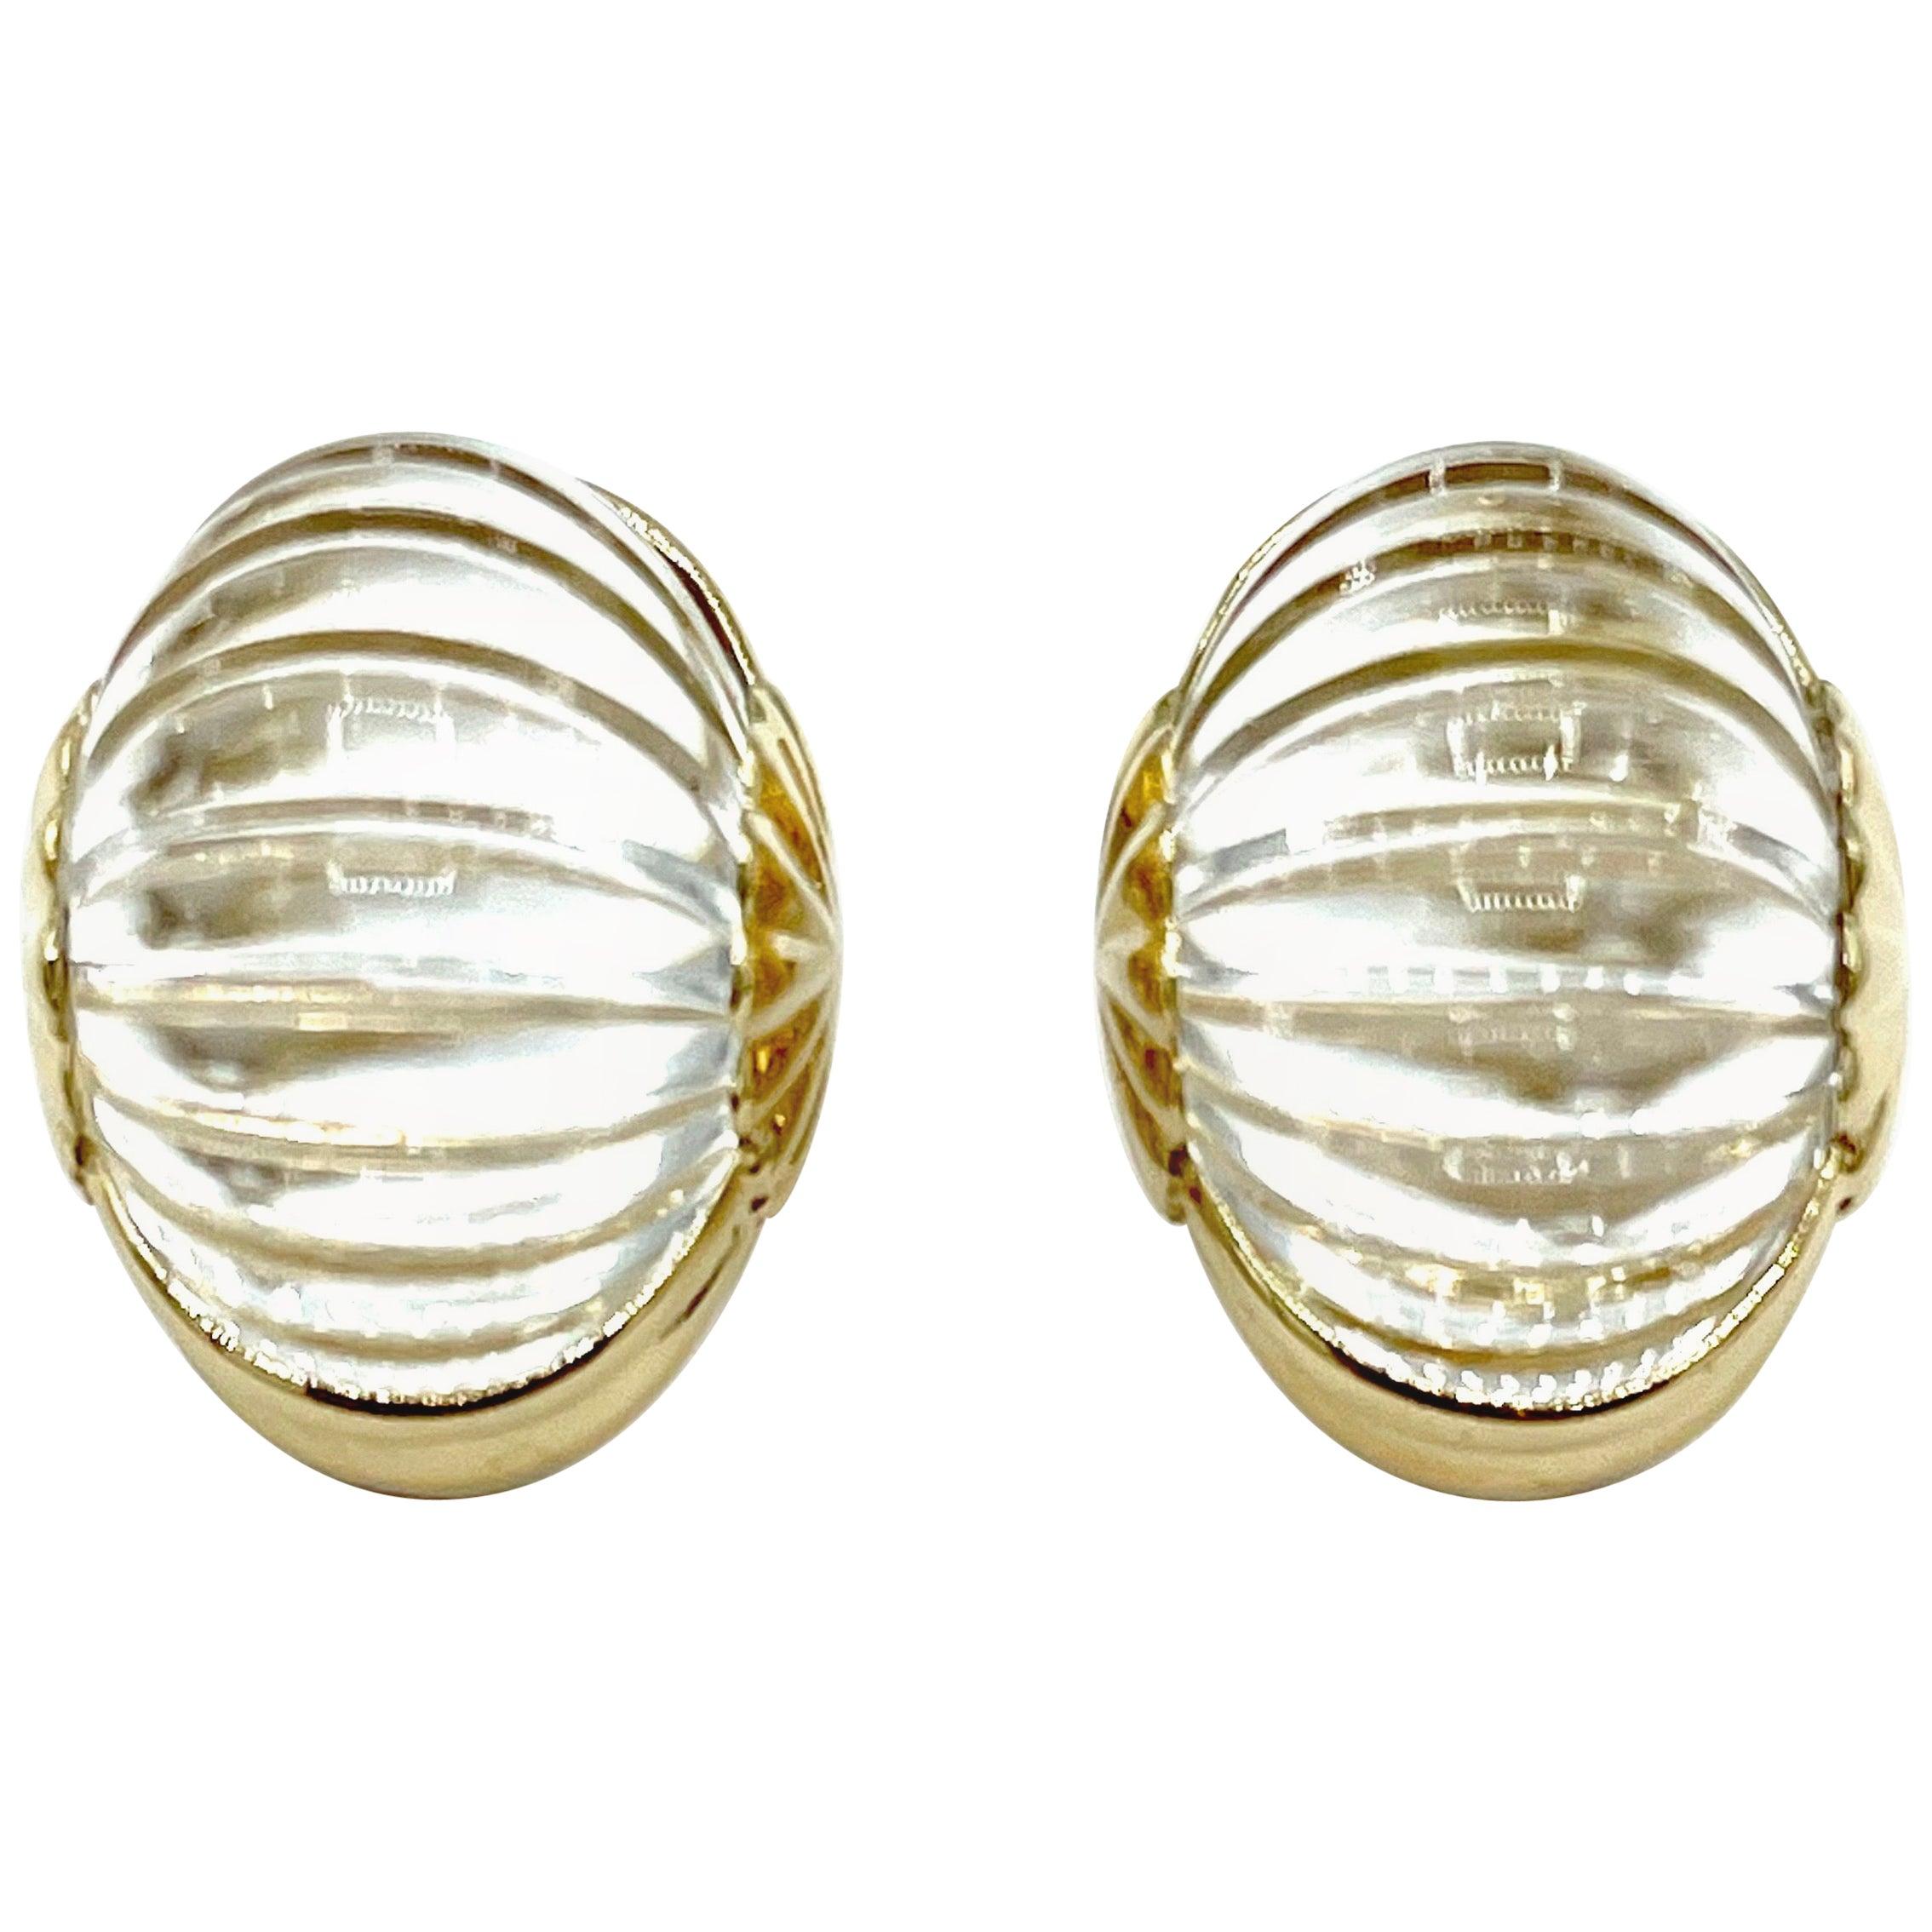 Scalloped Rock Crystal Quartz and 14 Karat Yellow Gold Clip Earrings